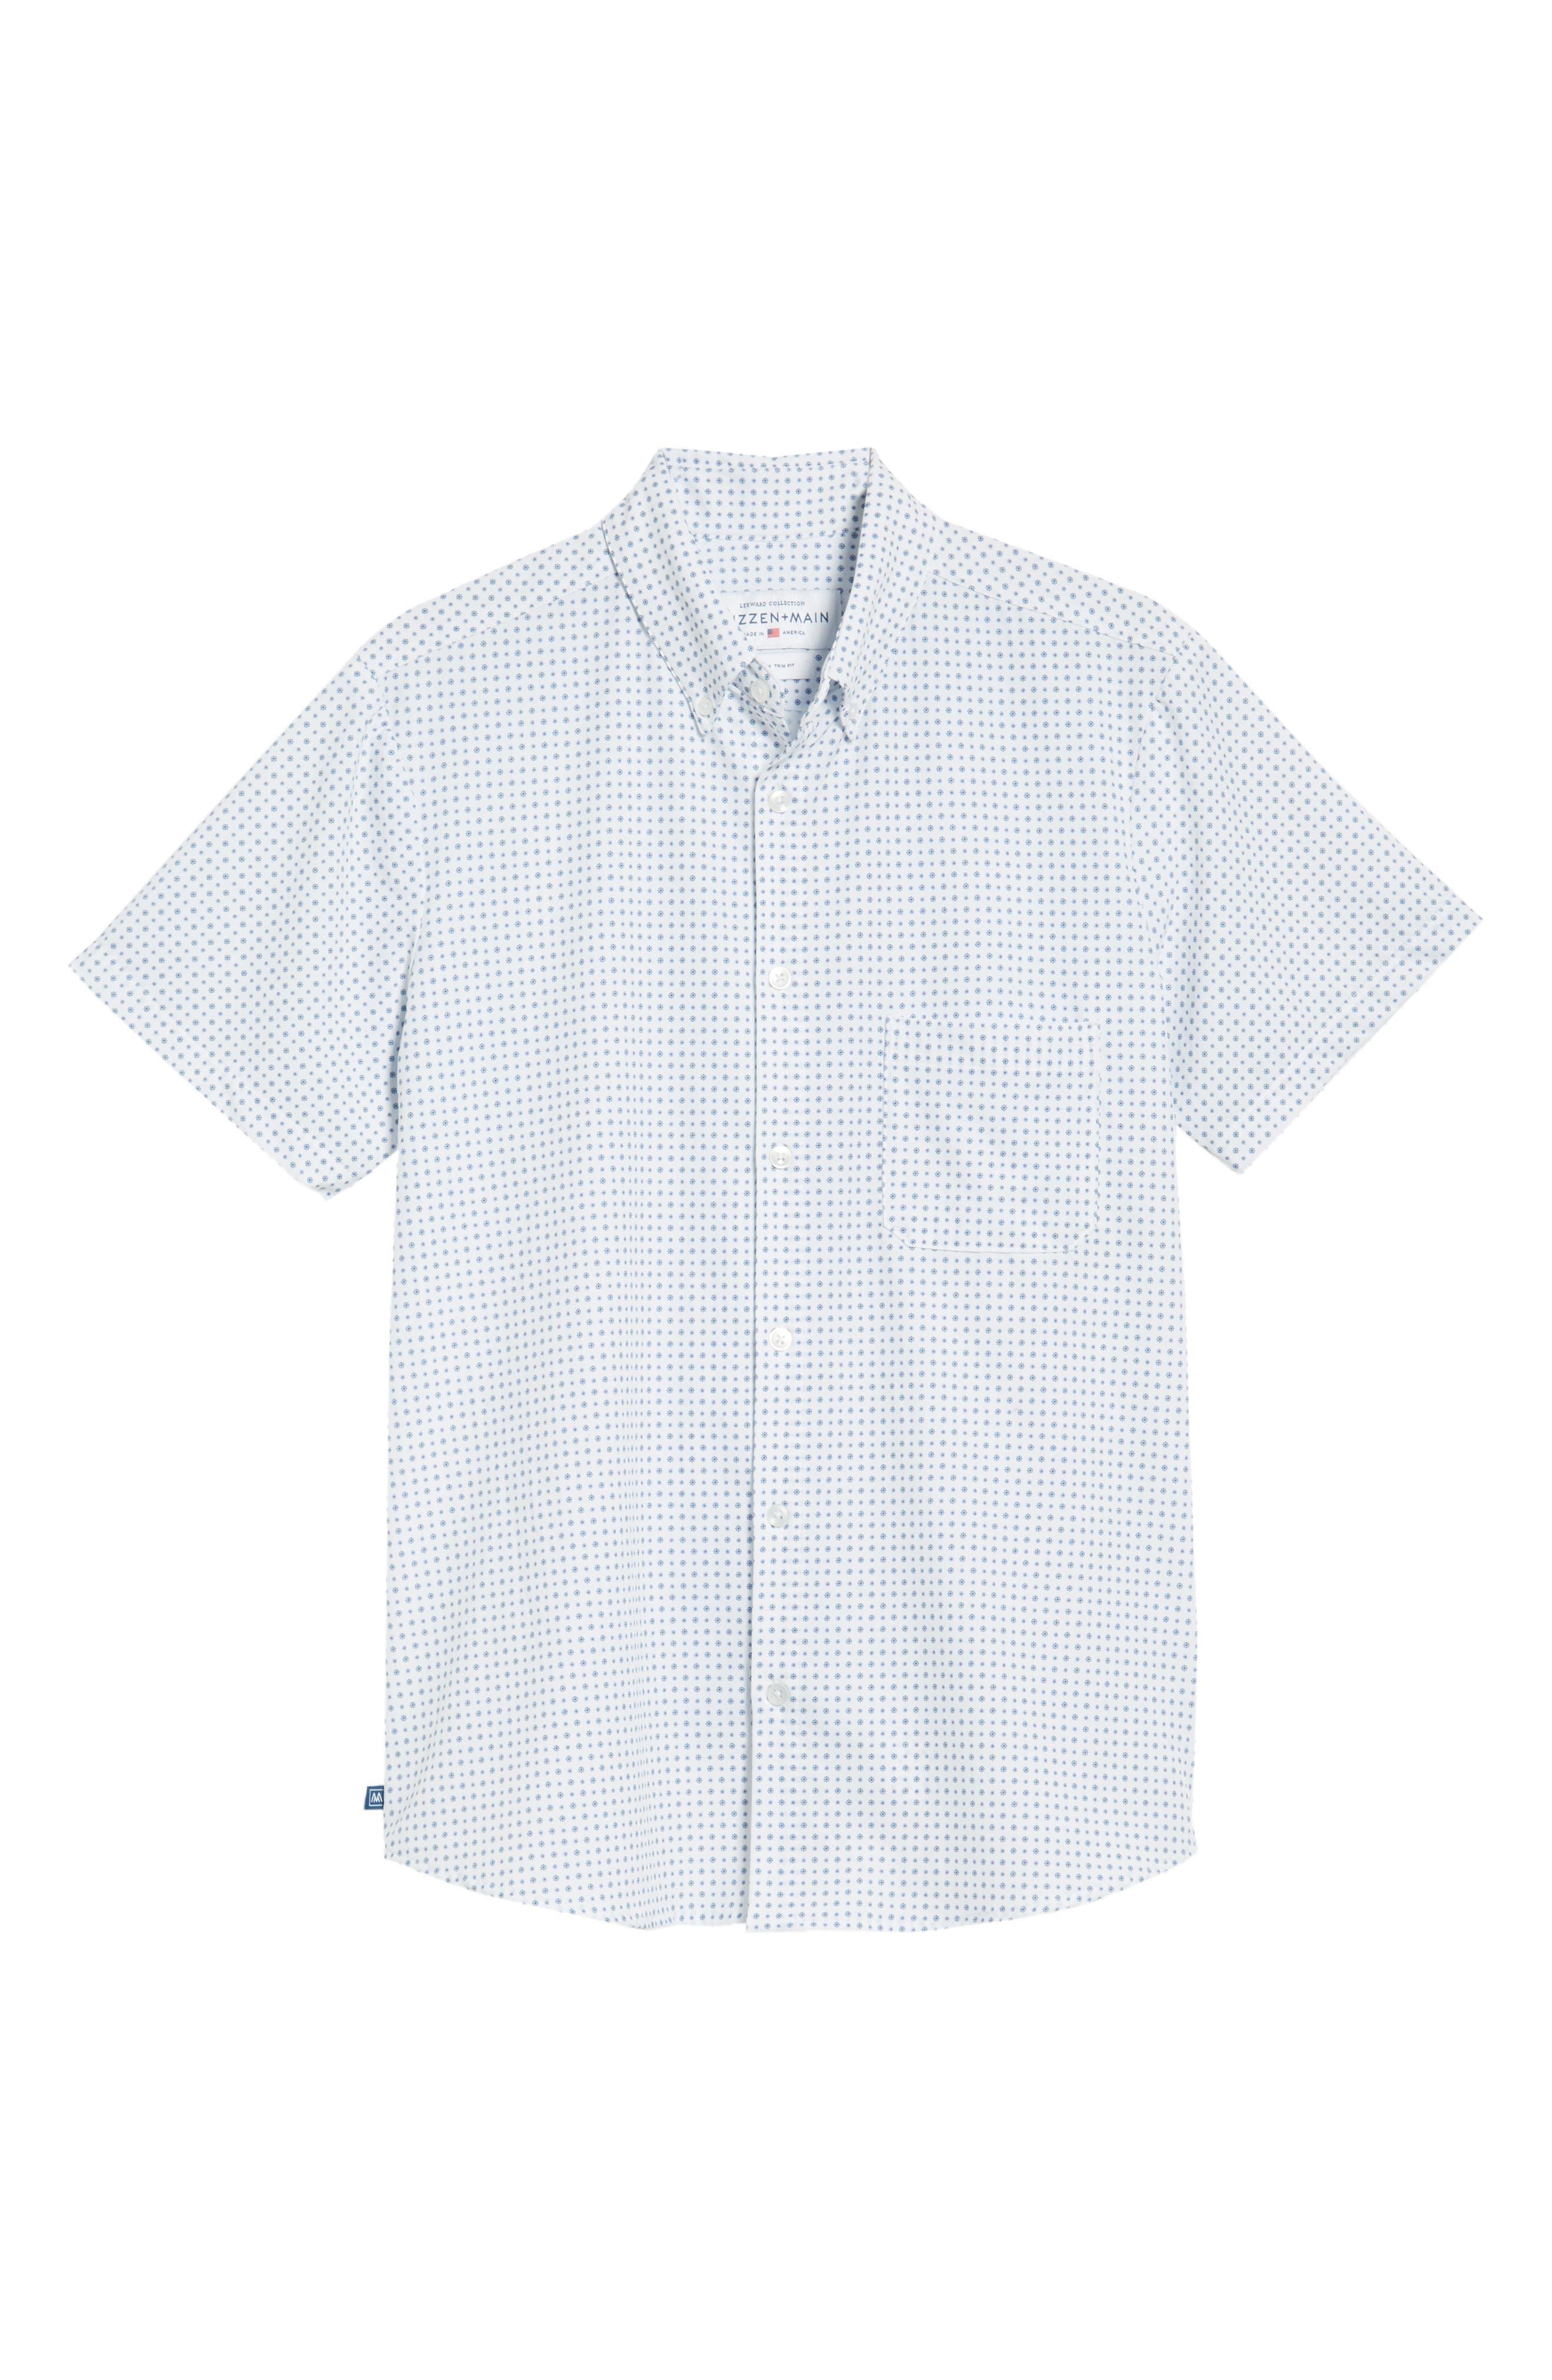 Darst Slim Fit Performance Sport Shirt,                             Alternate thumbnail 6, color,                             White